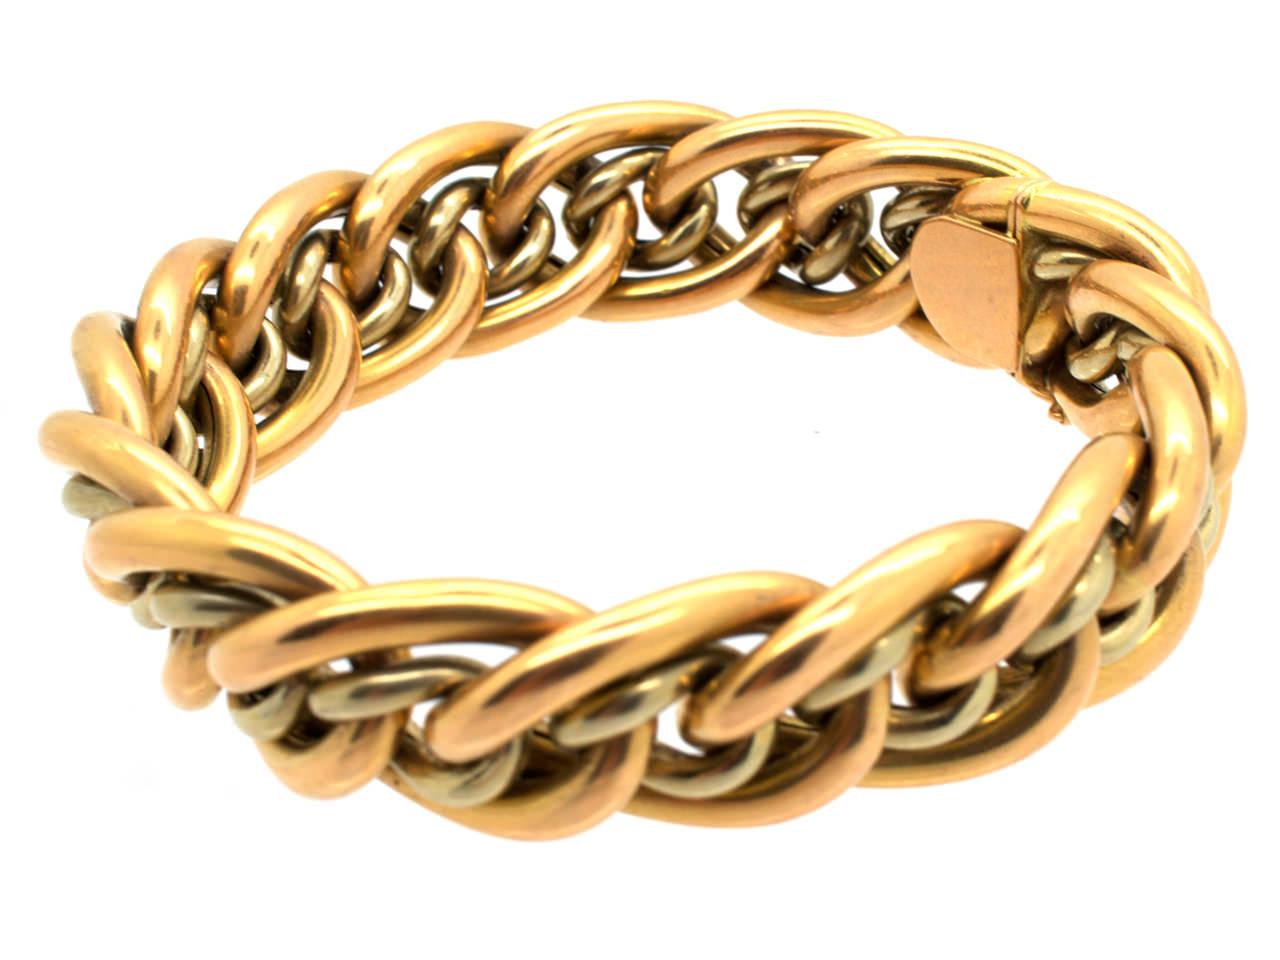 Edwardian 18ct Gold Woven Bracelet